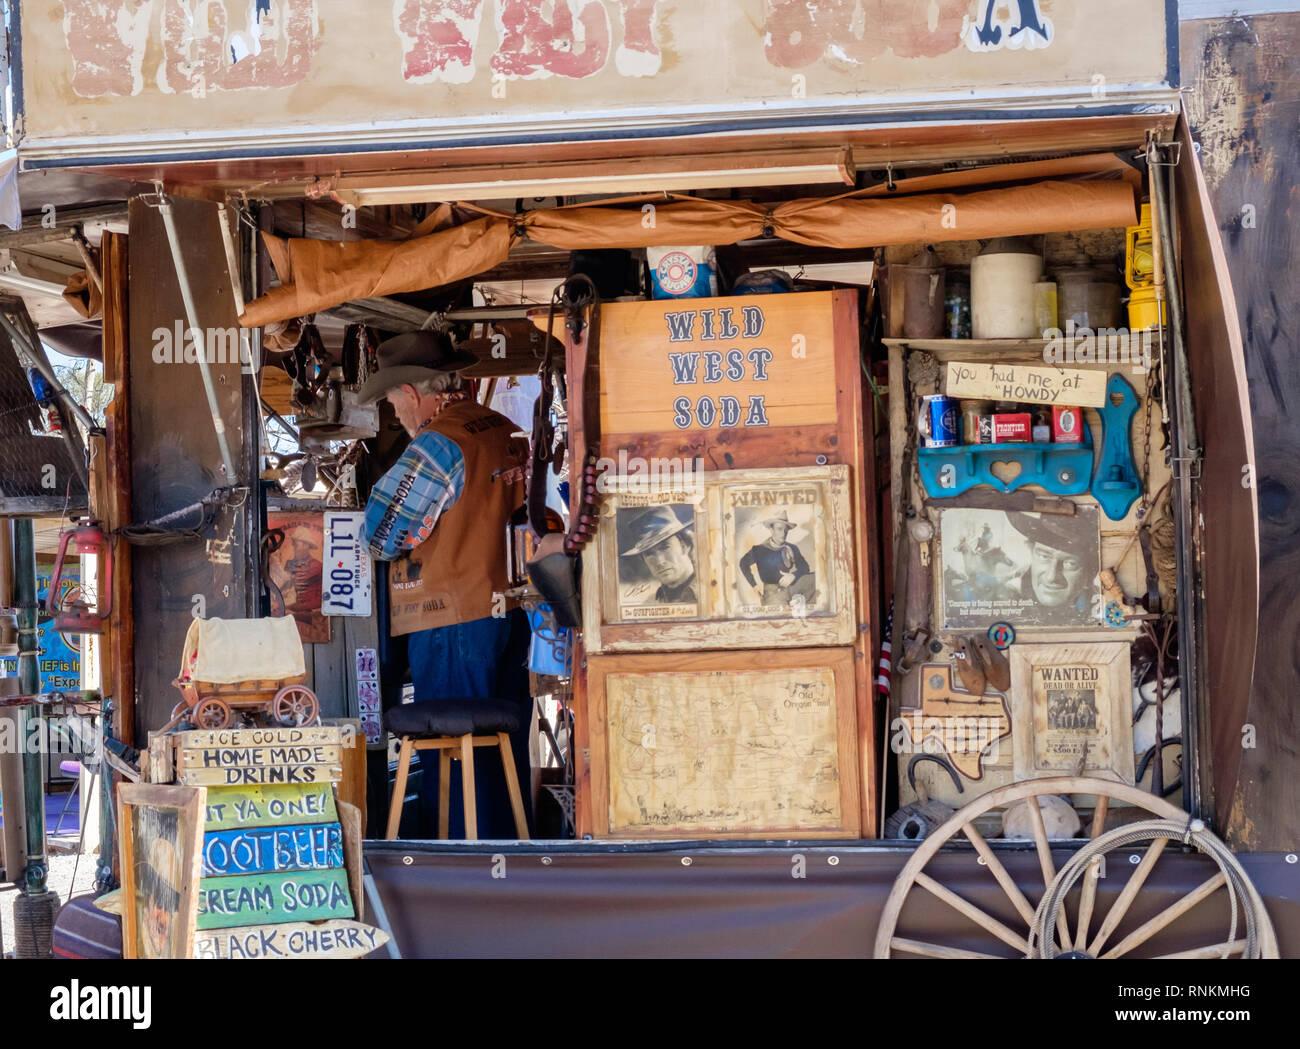 Wild West Soda Market Booth at Third Monday Trade Days Market, McKinney Texas. March 2018 - Stock Image